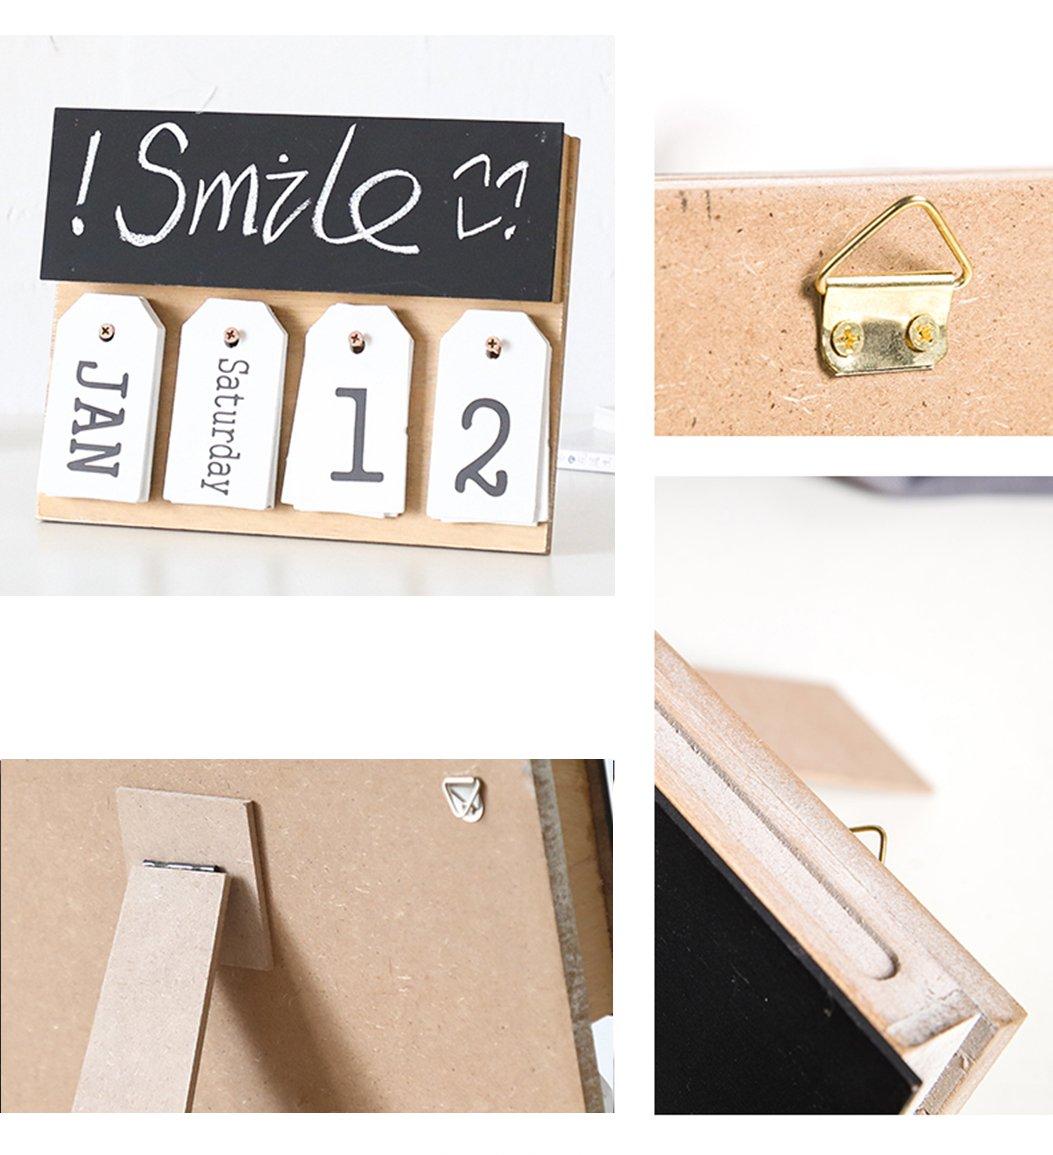 Black Wooden Perpetual Calendar Shabby Vintage Creative Wooden Square Calendar Desktop Accessories